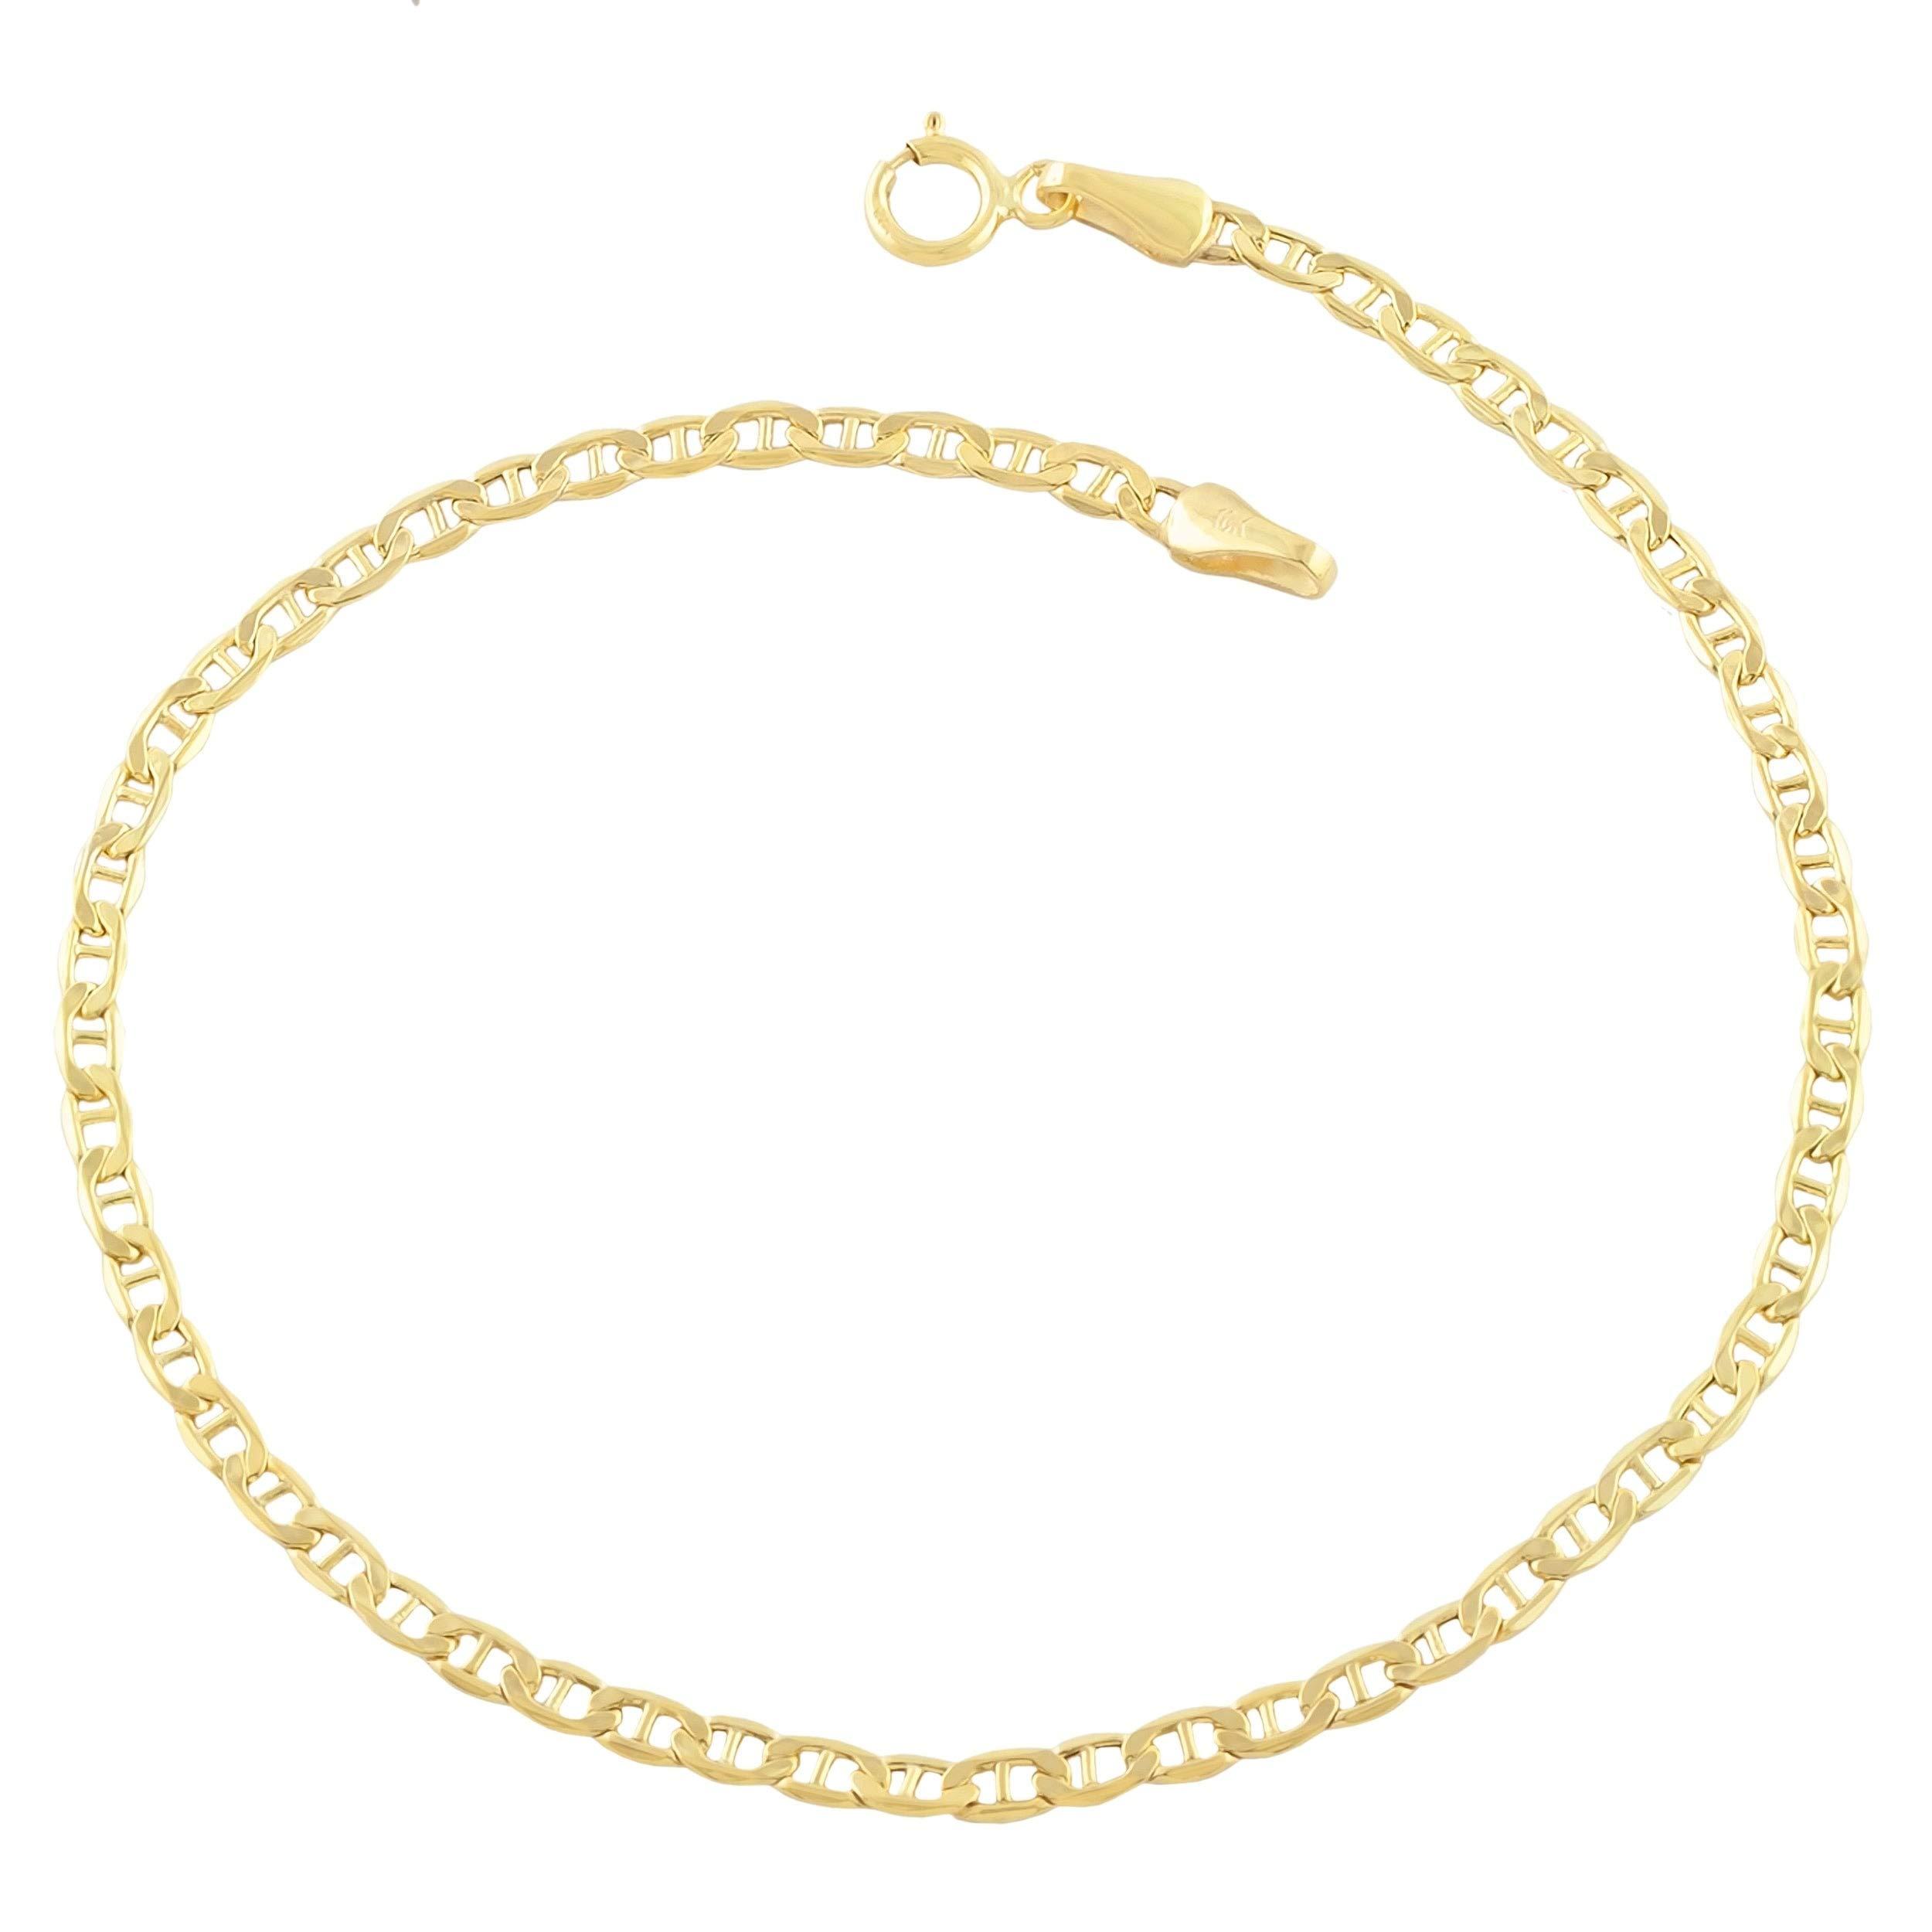 Verona Jewelers 14K Gold Anklets for Women. 14K 10 Inch Anklet, Gold Flat Mariner Anklet, 14K Gold Box Chain (Mariner)